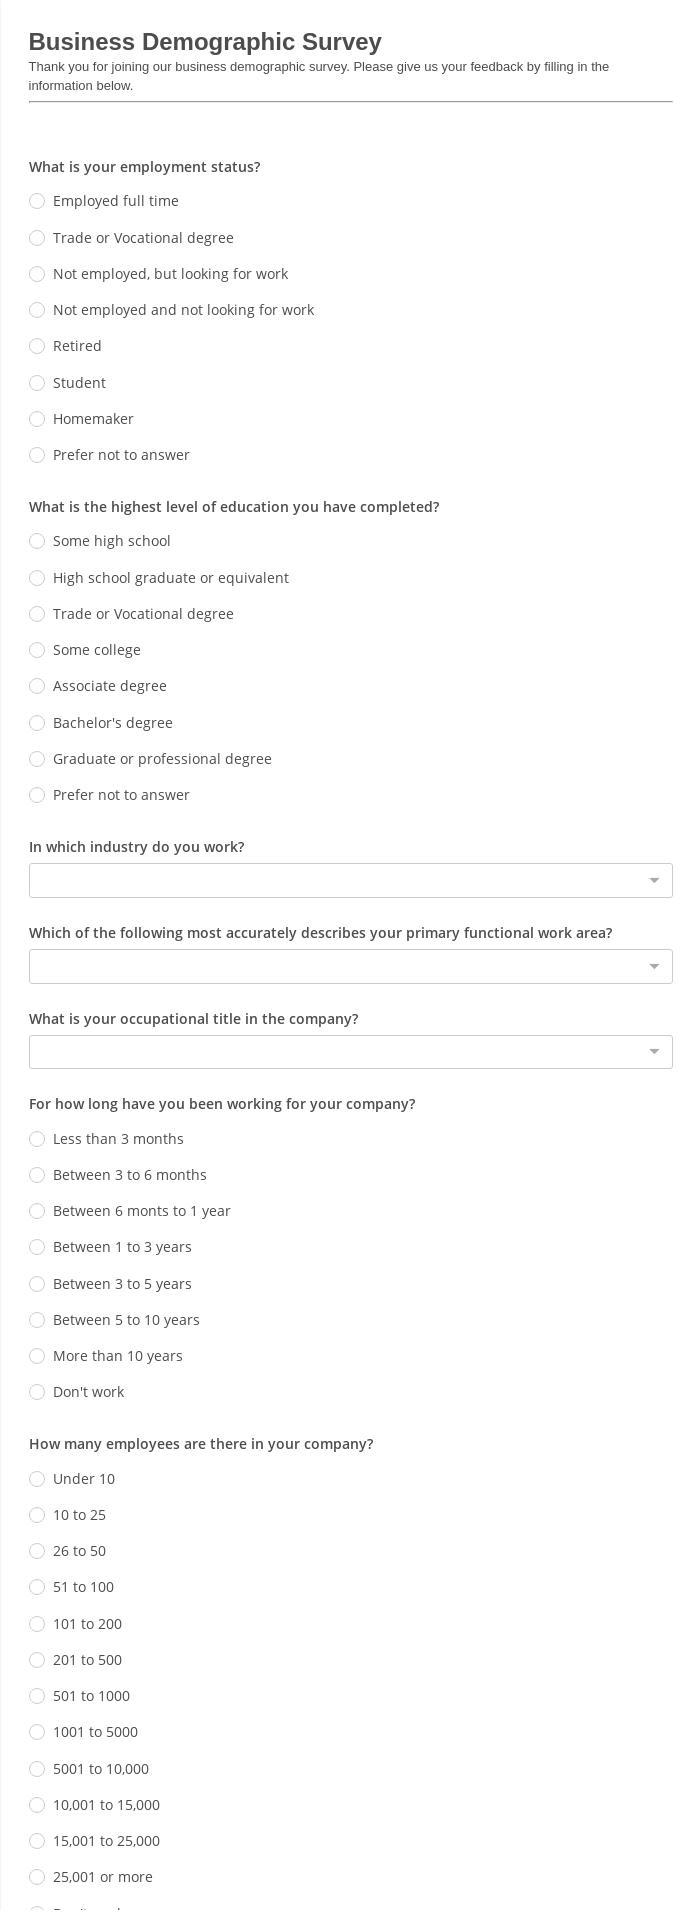 Business Demographic Survey